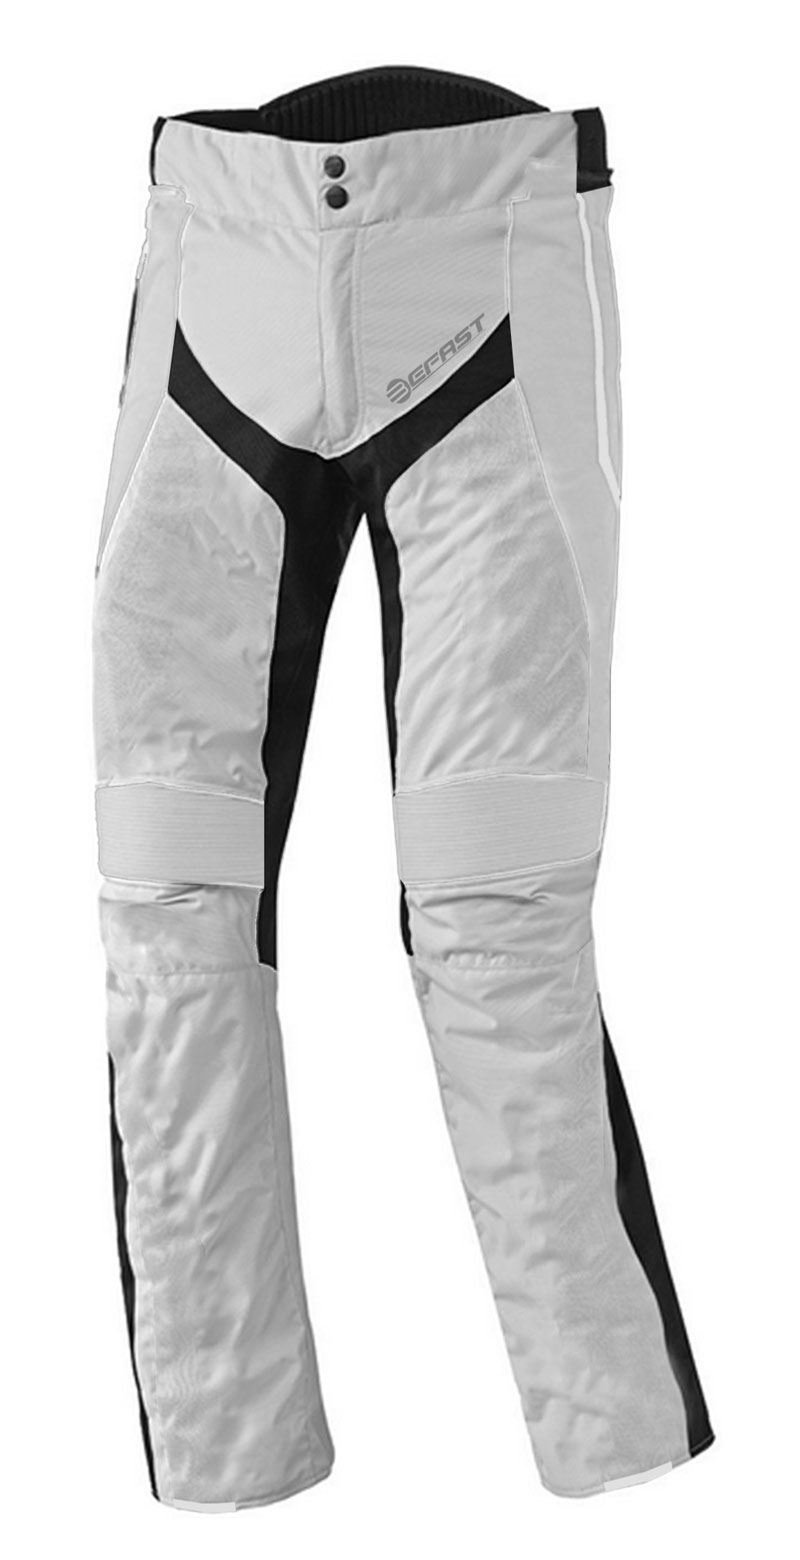 Pantaloni moto touring Befast Delta Grigio